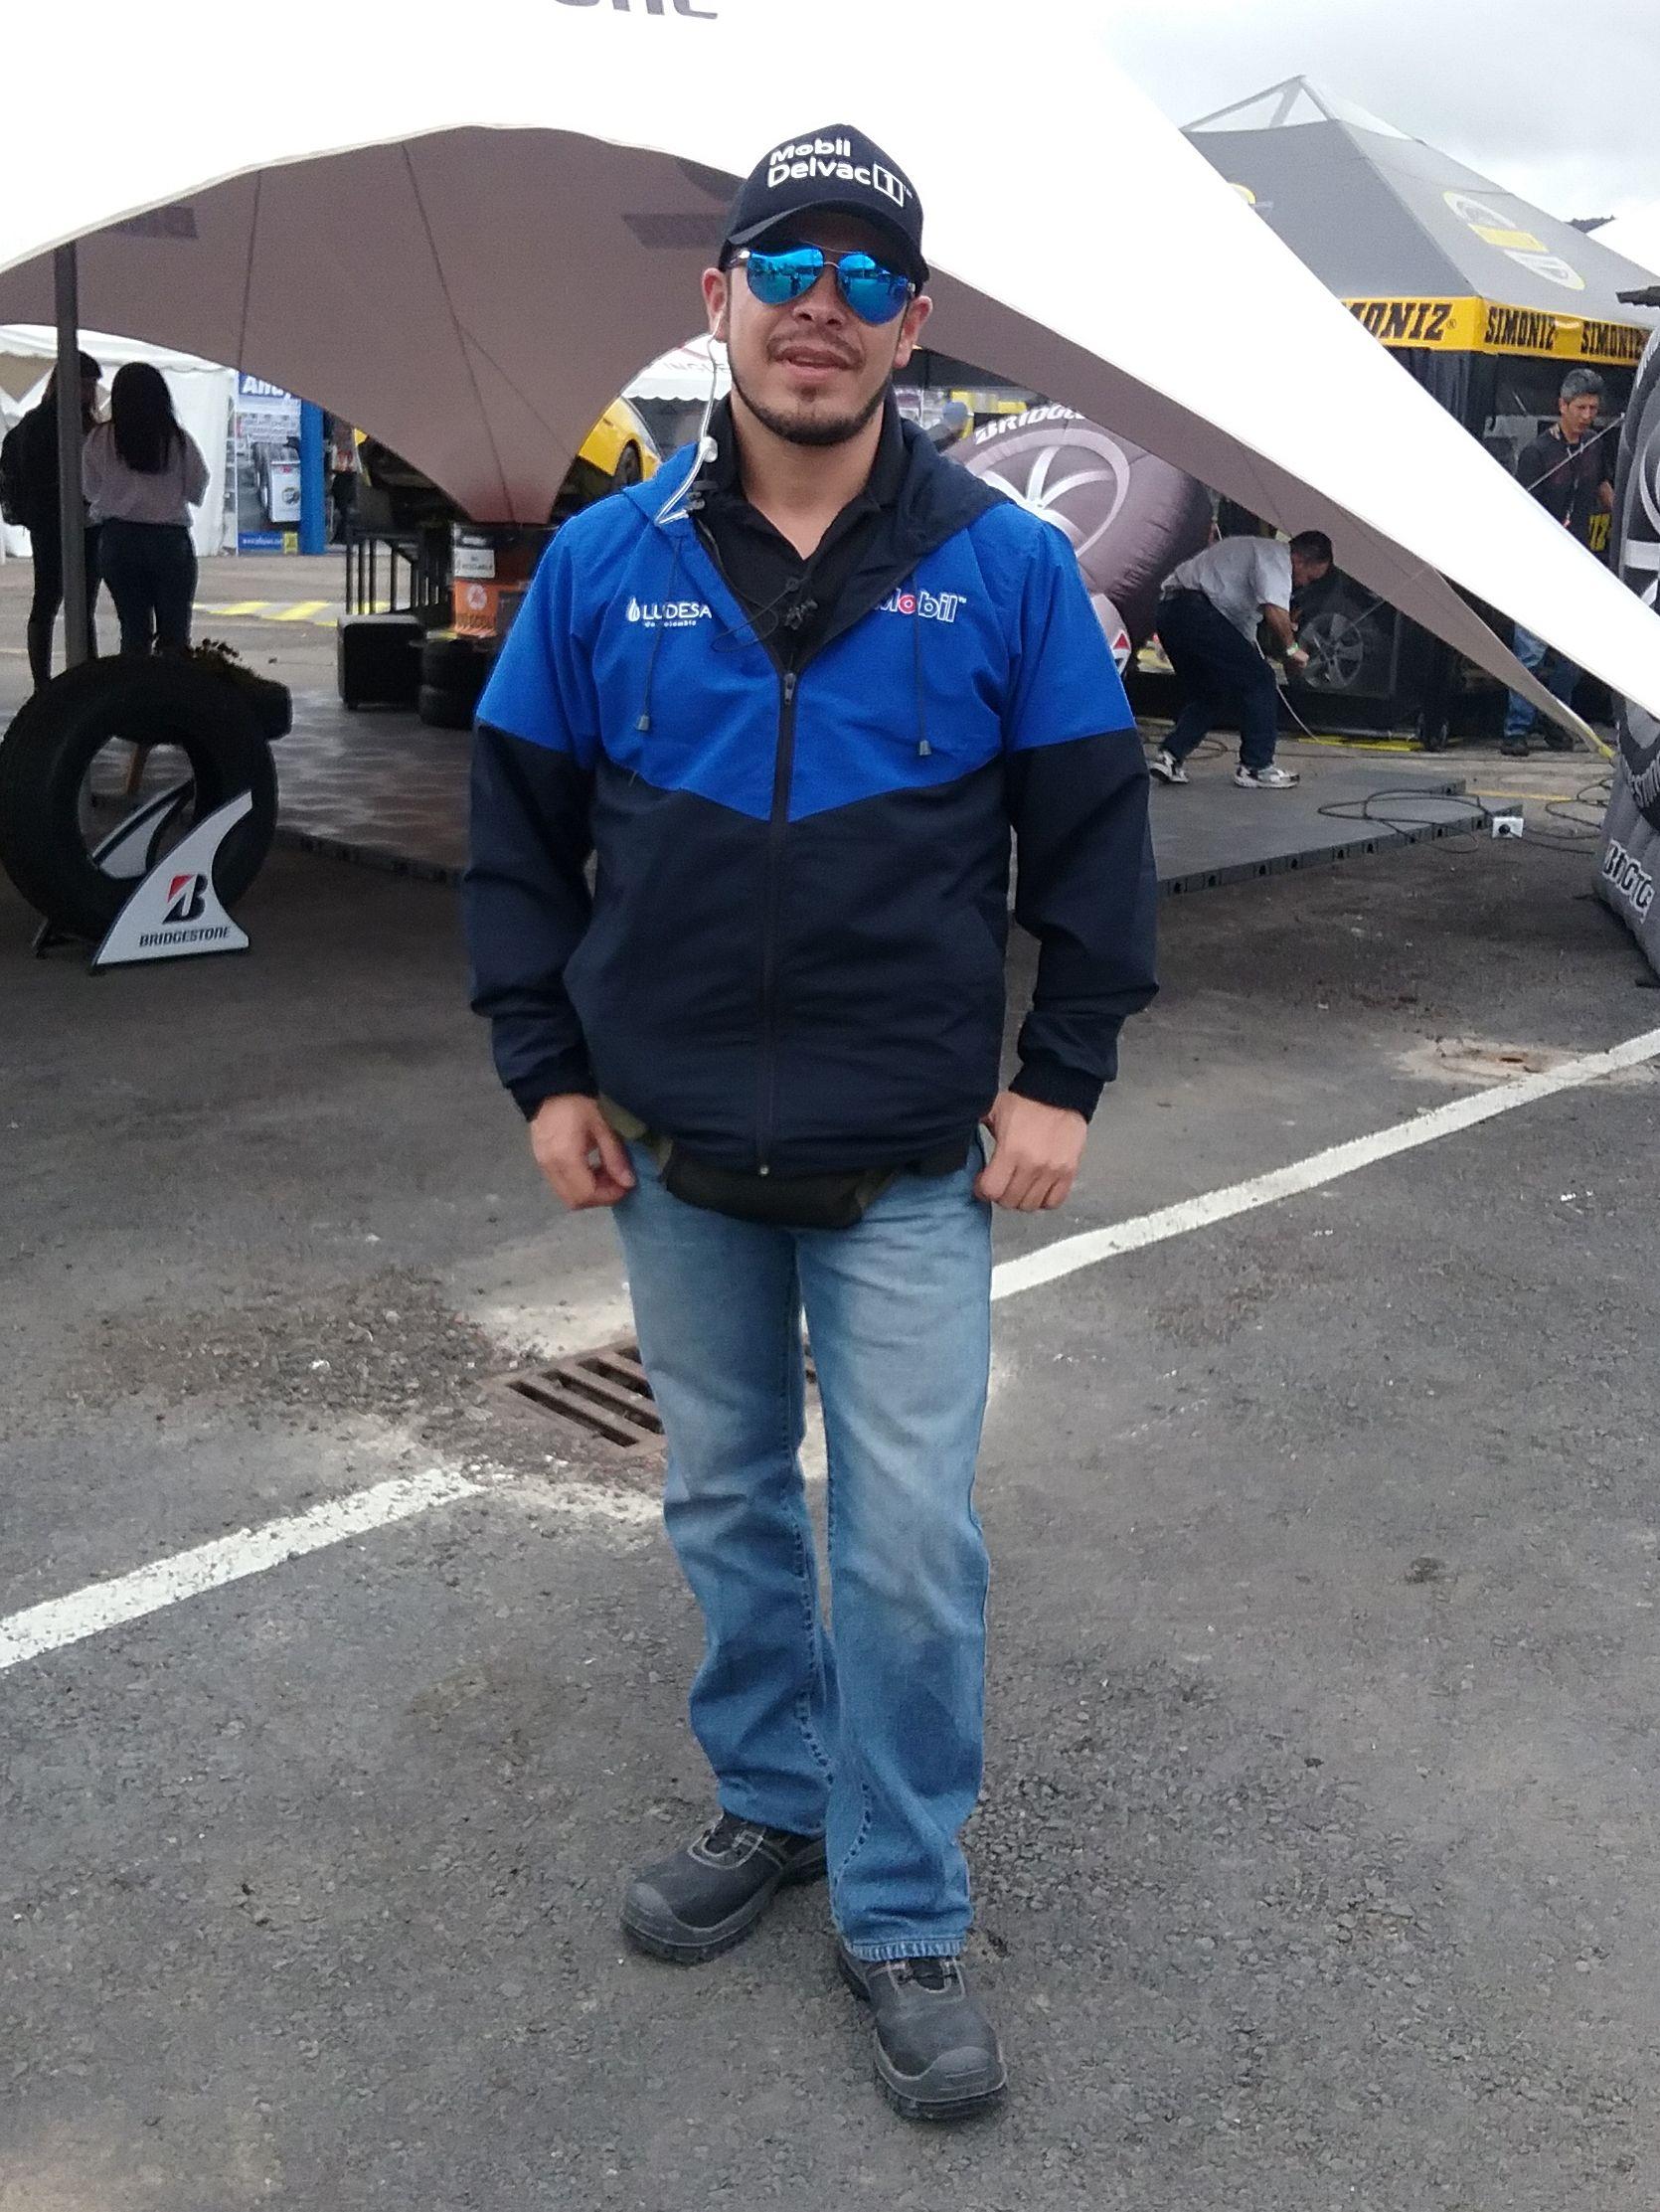 Edwin Rubiano Coordinador Nacional Marketing,Ludesa De Colombia , Evento, 29 Gran Premio Nacional Mobil Delvac.